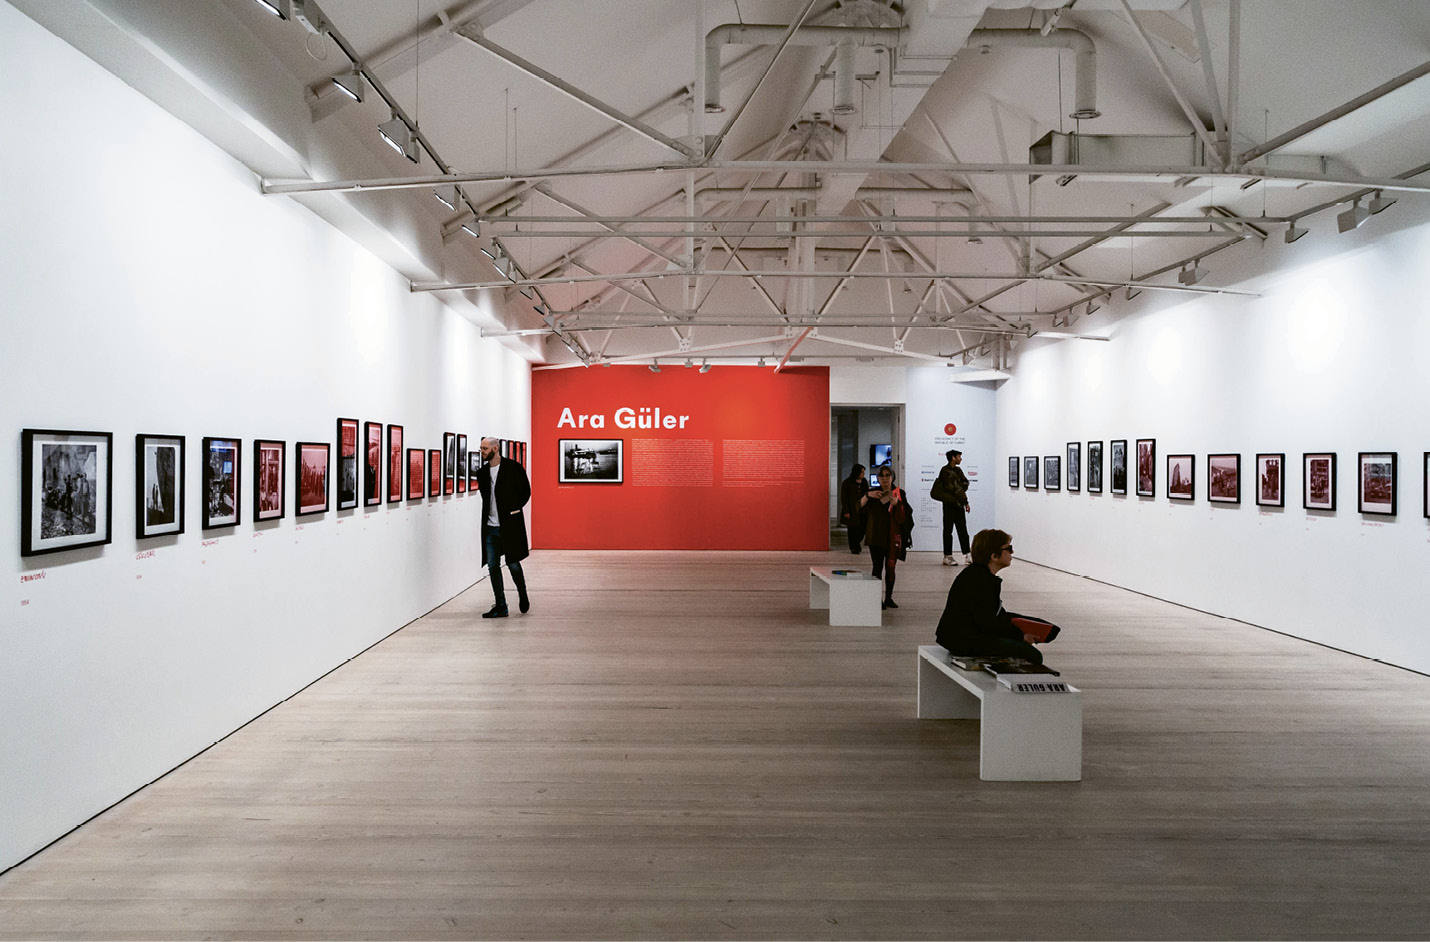 A retrospective of the works of Turkish photojournalist Ara Güler at Chelsea's Saatchi Gallery last spring